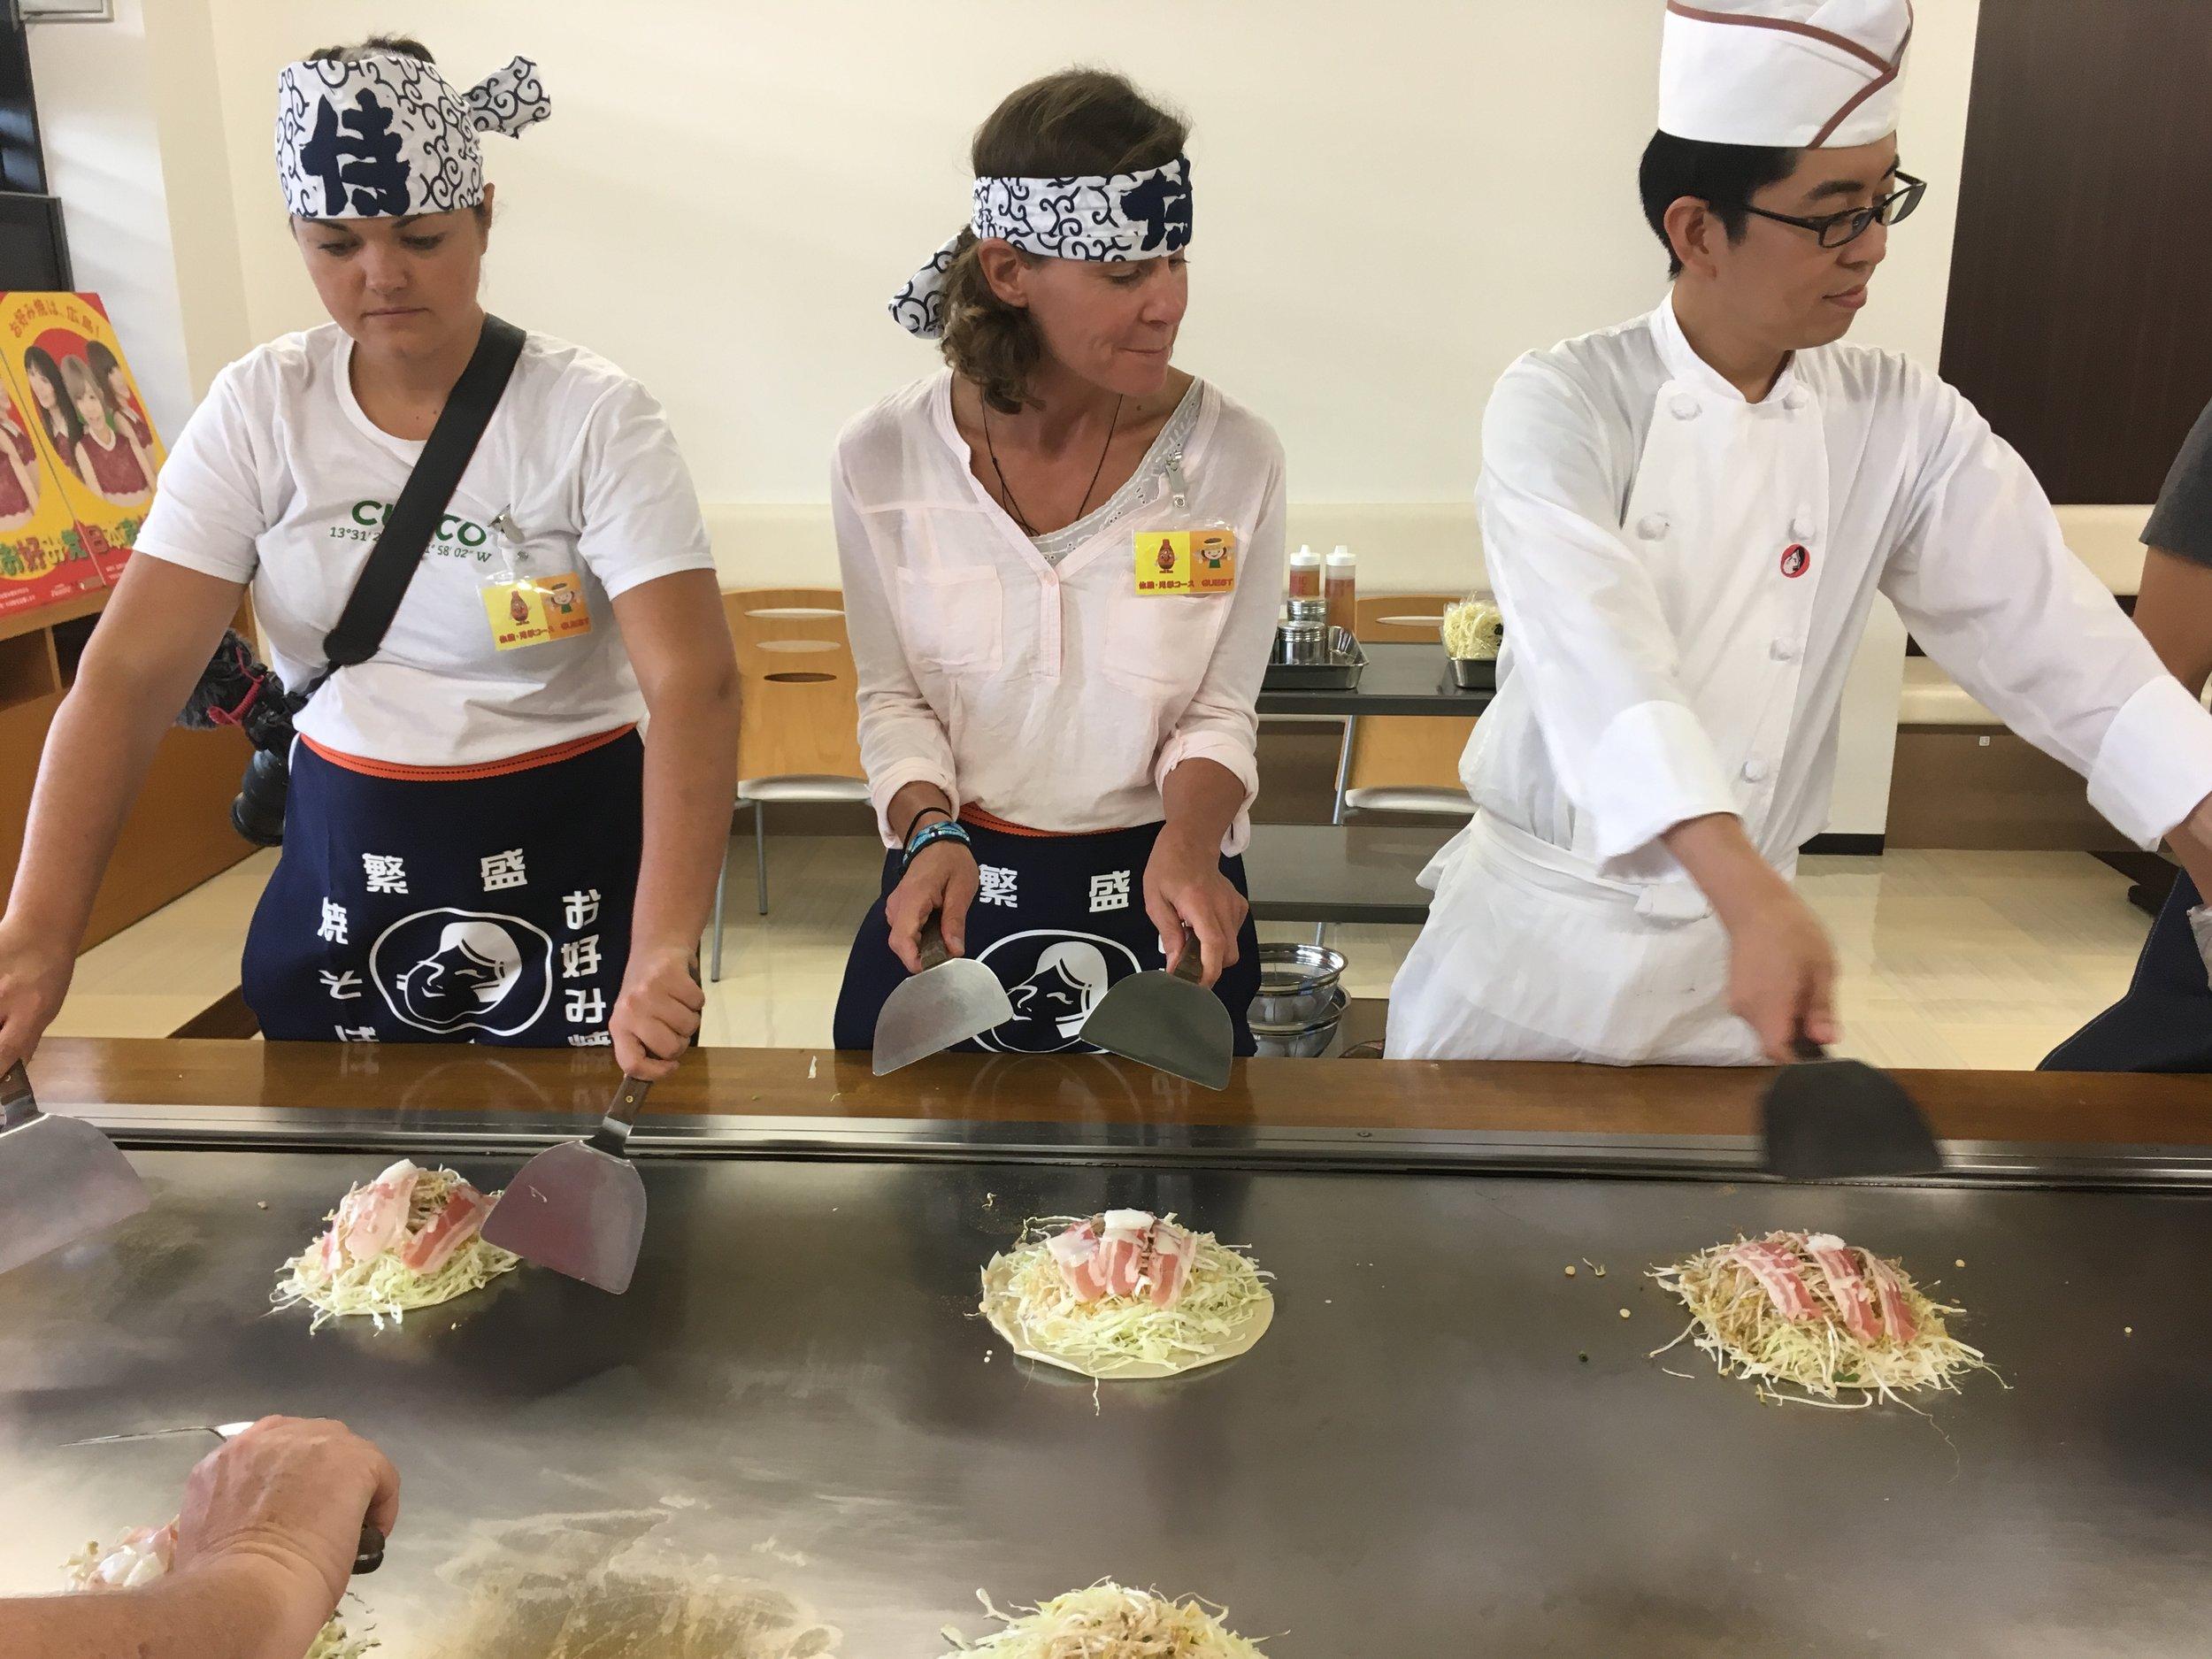 Practicing the art of okonomiyaki at the Otafuku factory